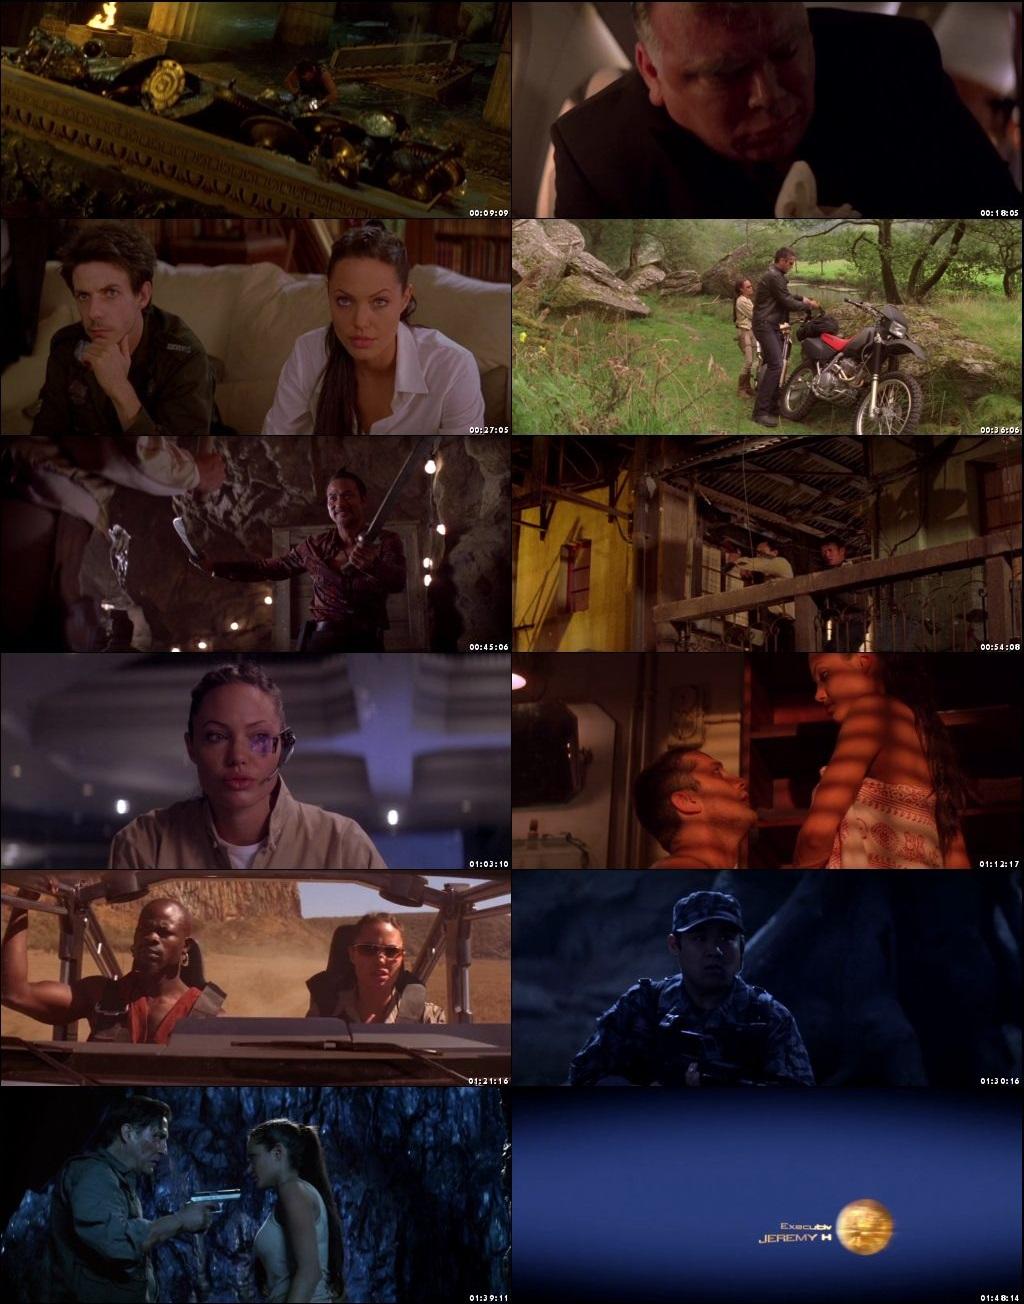 Lara Croft Tomb Raider 2001 Full Hindi Dual Audio Movie Download 720p 480p Brrip 480p Tv Series